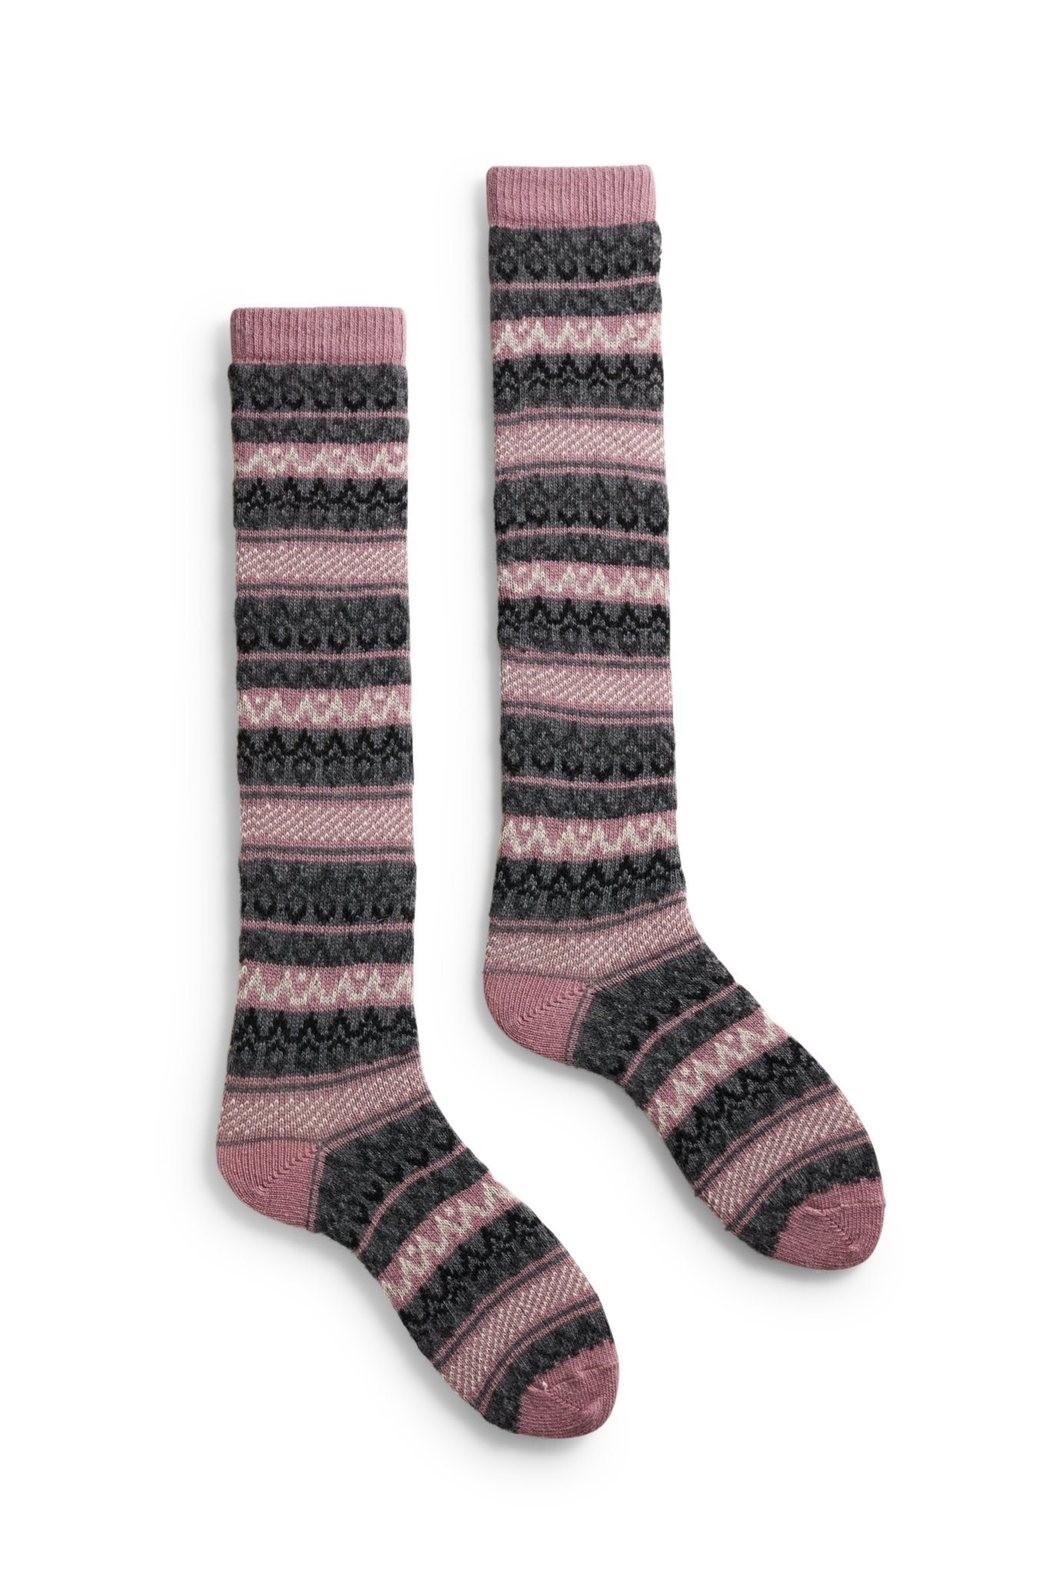 7f8531a6f socks fair isle knee high in mauve wool and cashmere - Boho-Chic Clothing